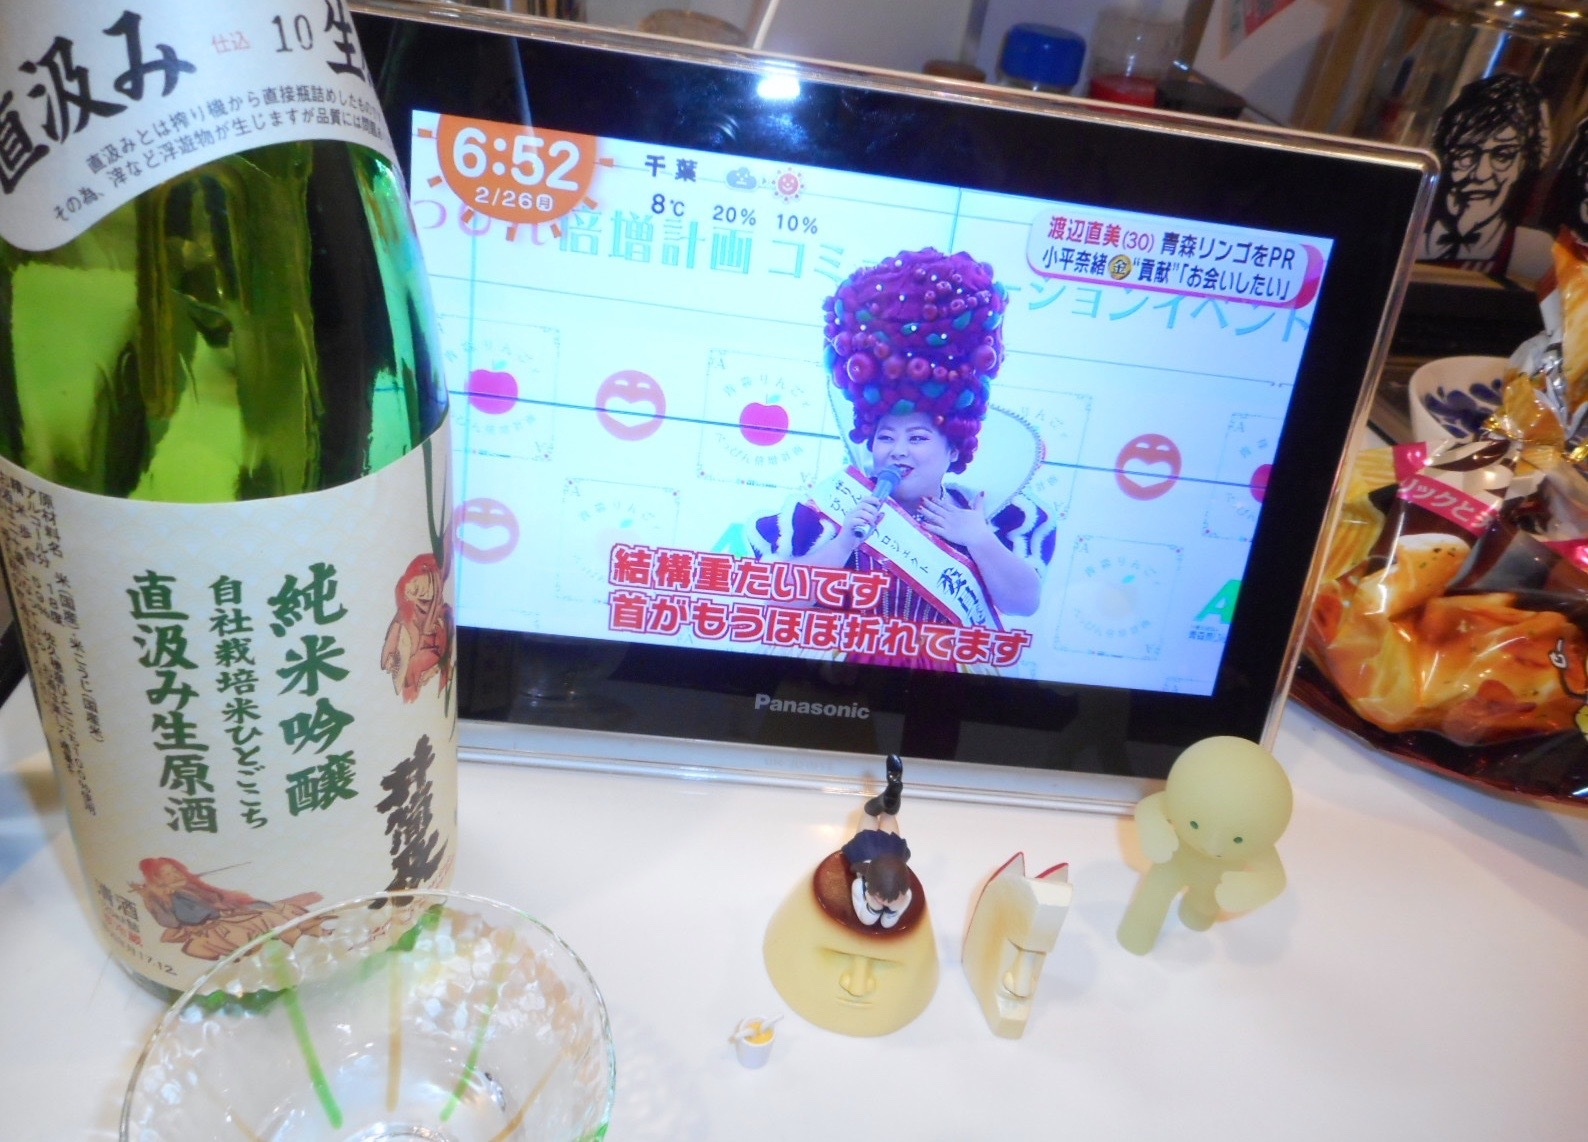 izutsuchou_jikagumi29by6.jpg